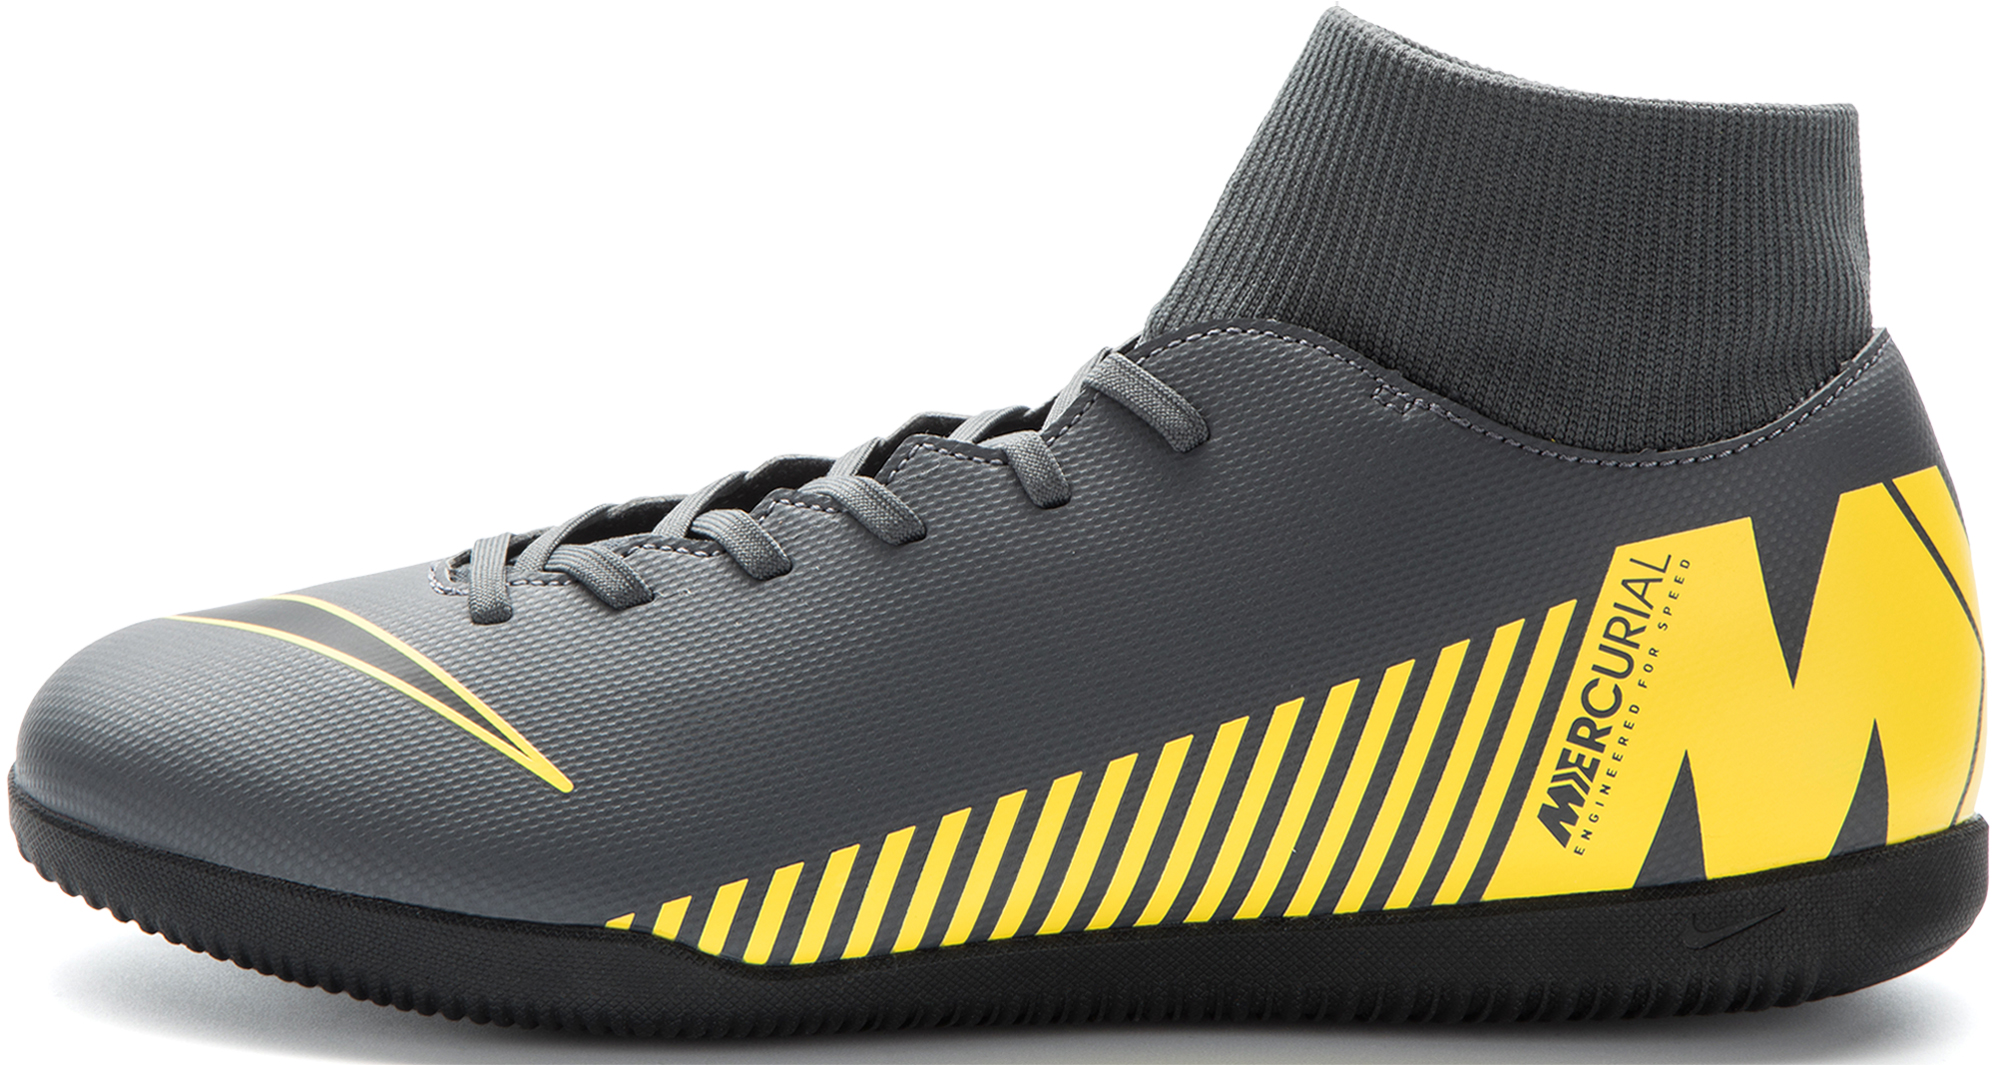 Nike Бутсы мужские Nike Mercurial Superfly 6 Club IC, размер 45 цена